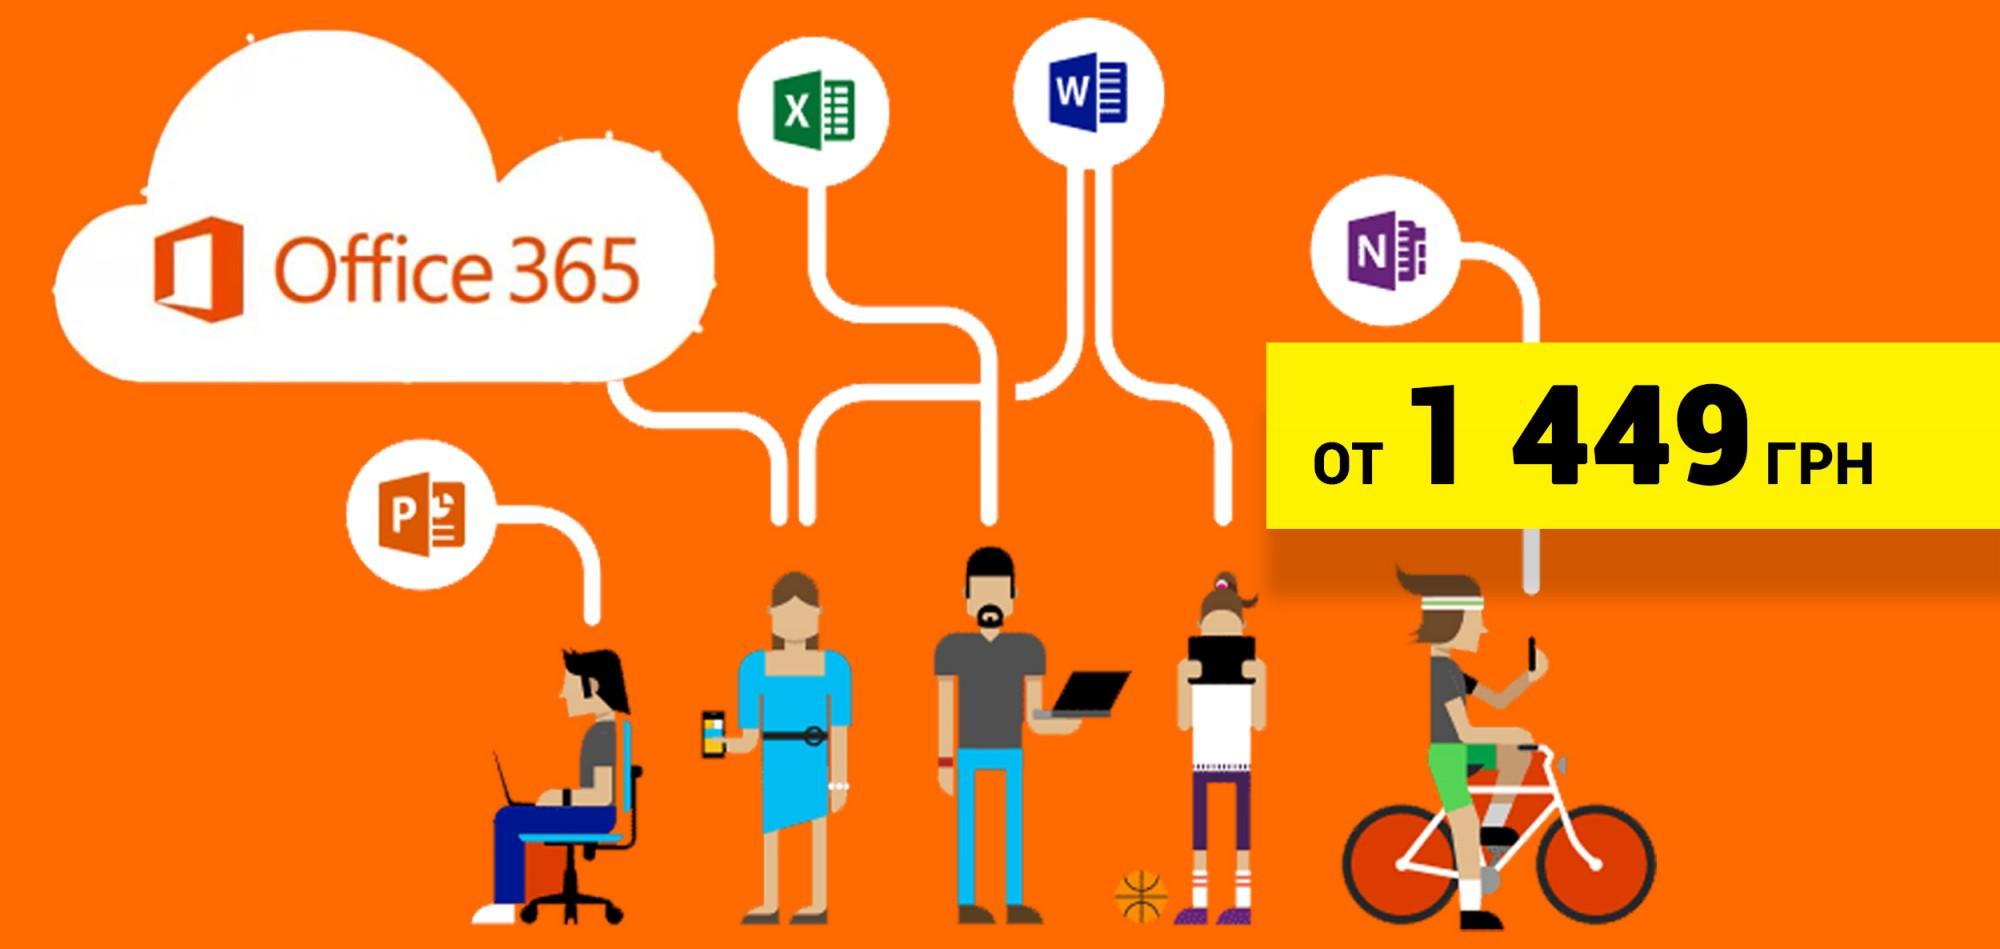 Купить Microsoft Office 365 home / personal